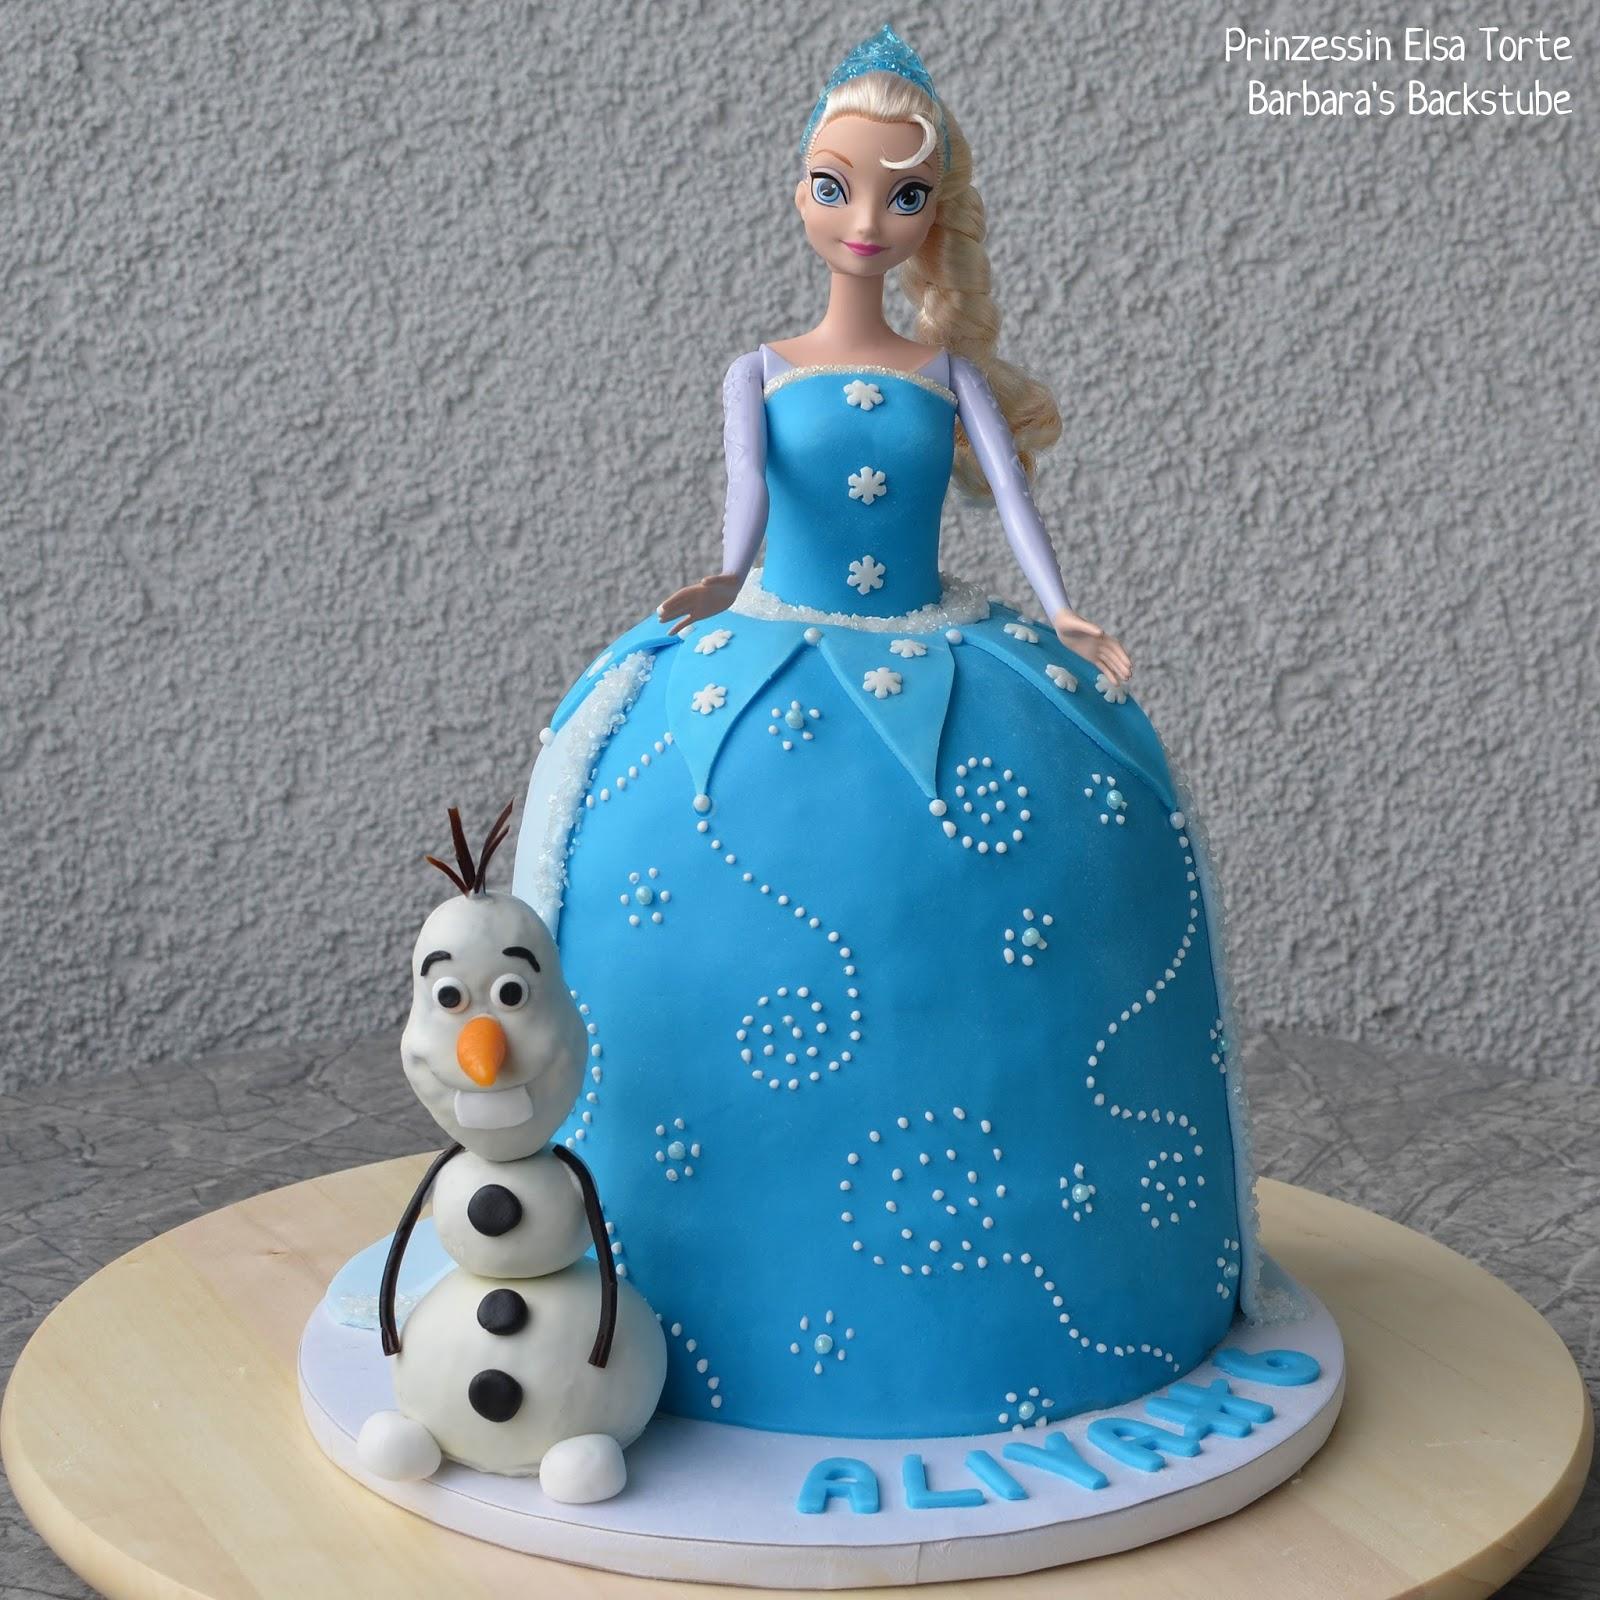 Barbara S Backstube Prinzessin Elsa Torte Luftiger Schokokuchen